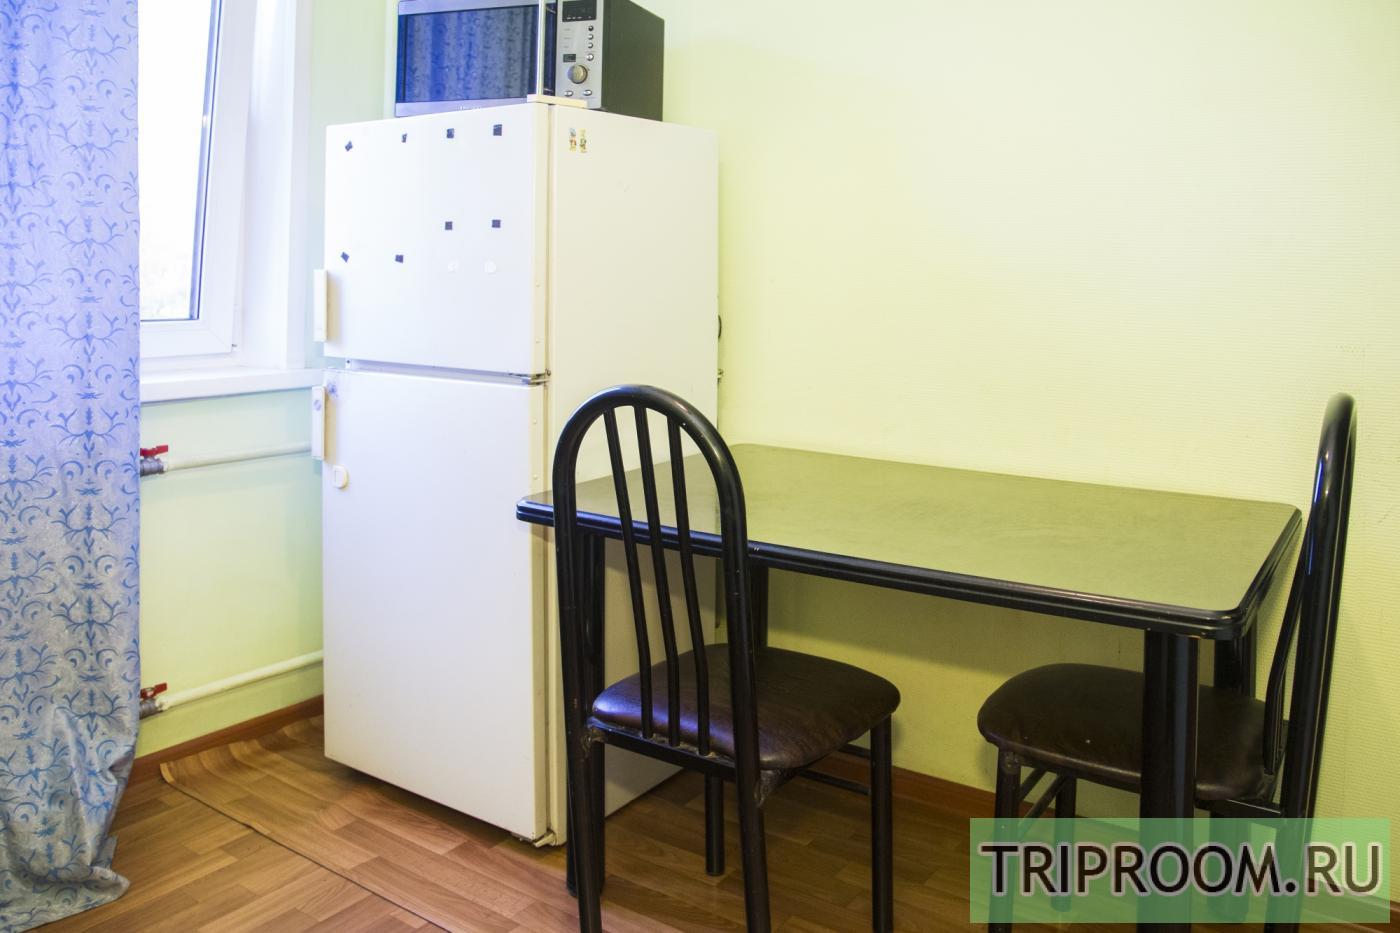 1-комнатная квартира посуточно (вариант № 6615), ул. Александра Матросова улица, фото № 6